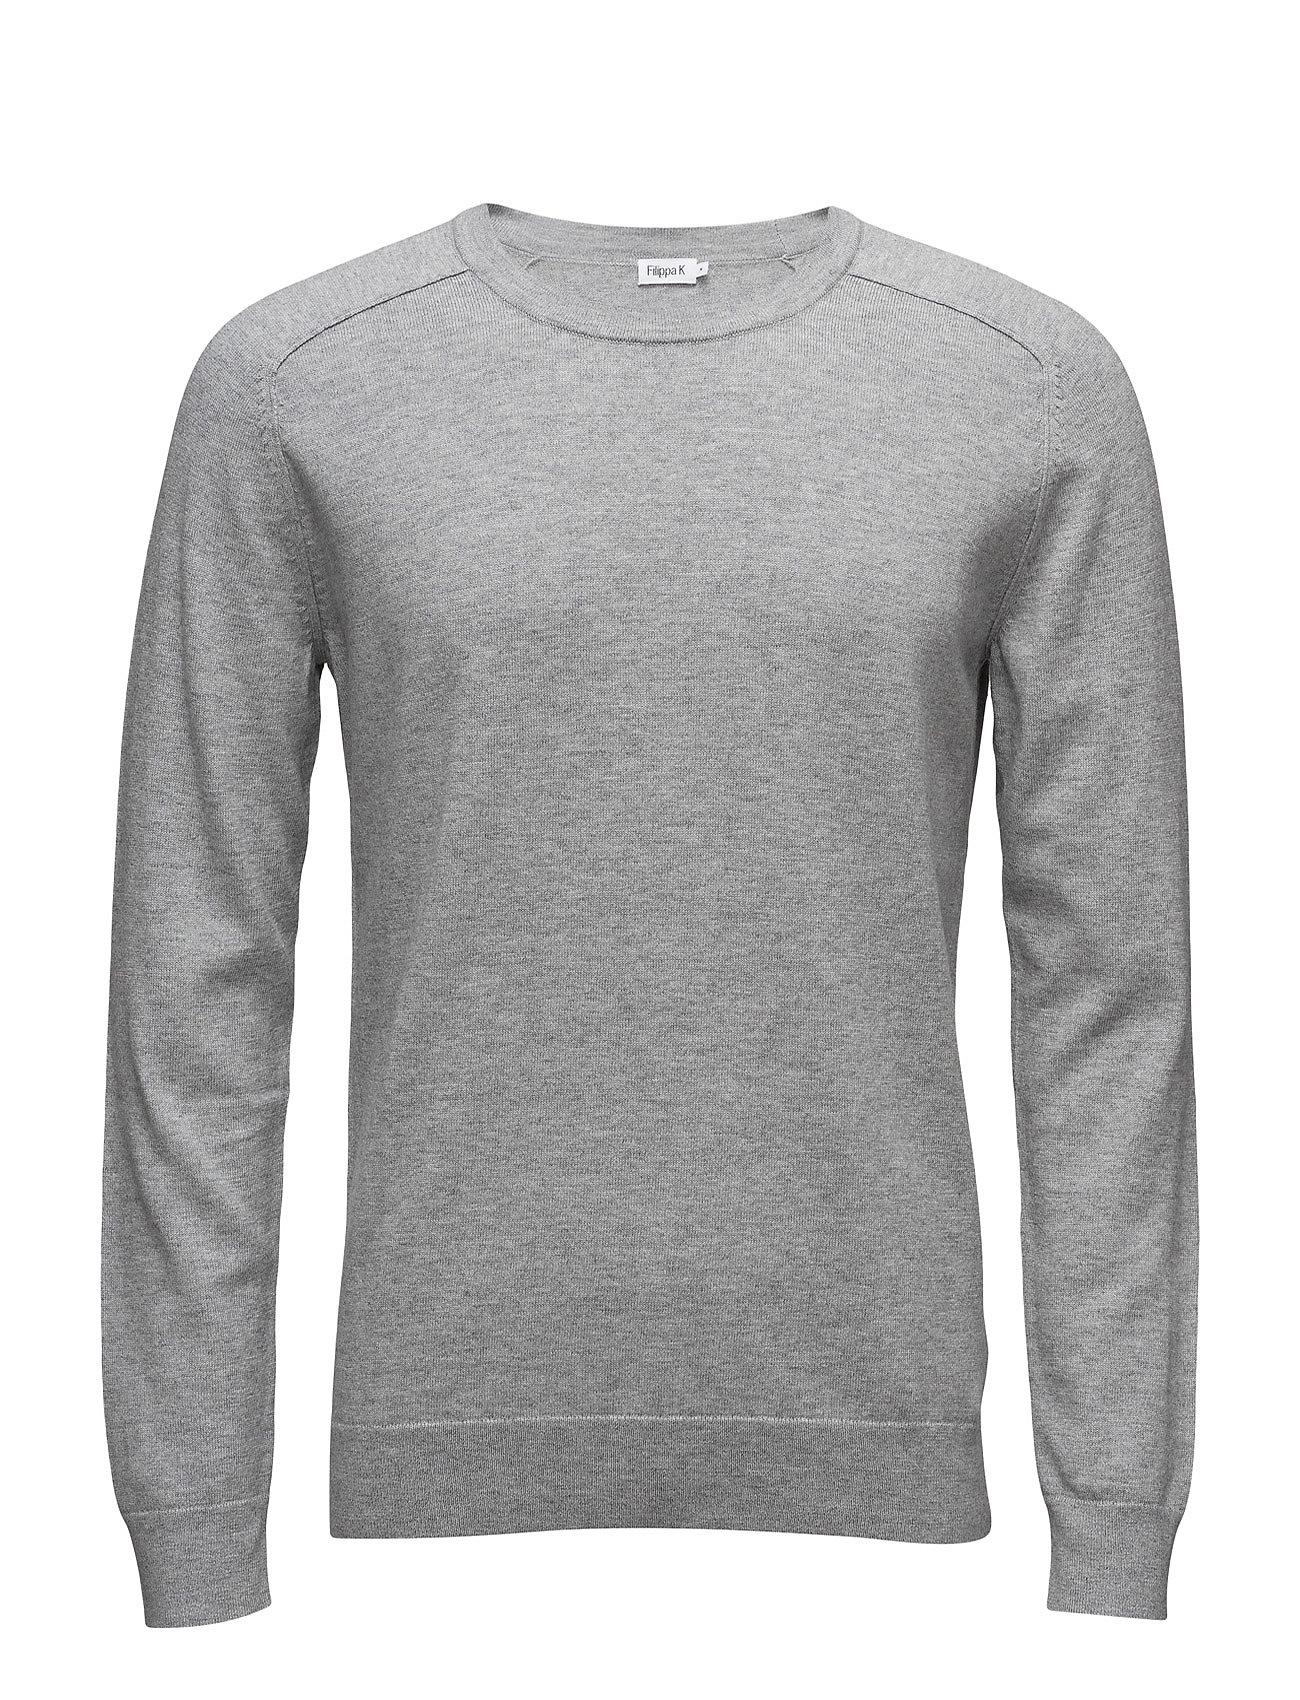 Filippa K M. Cotton Merino Sweater - LIGHT GREY